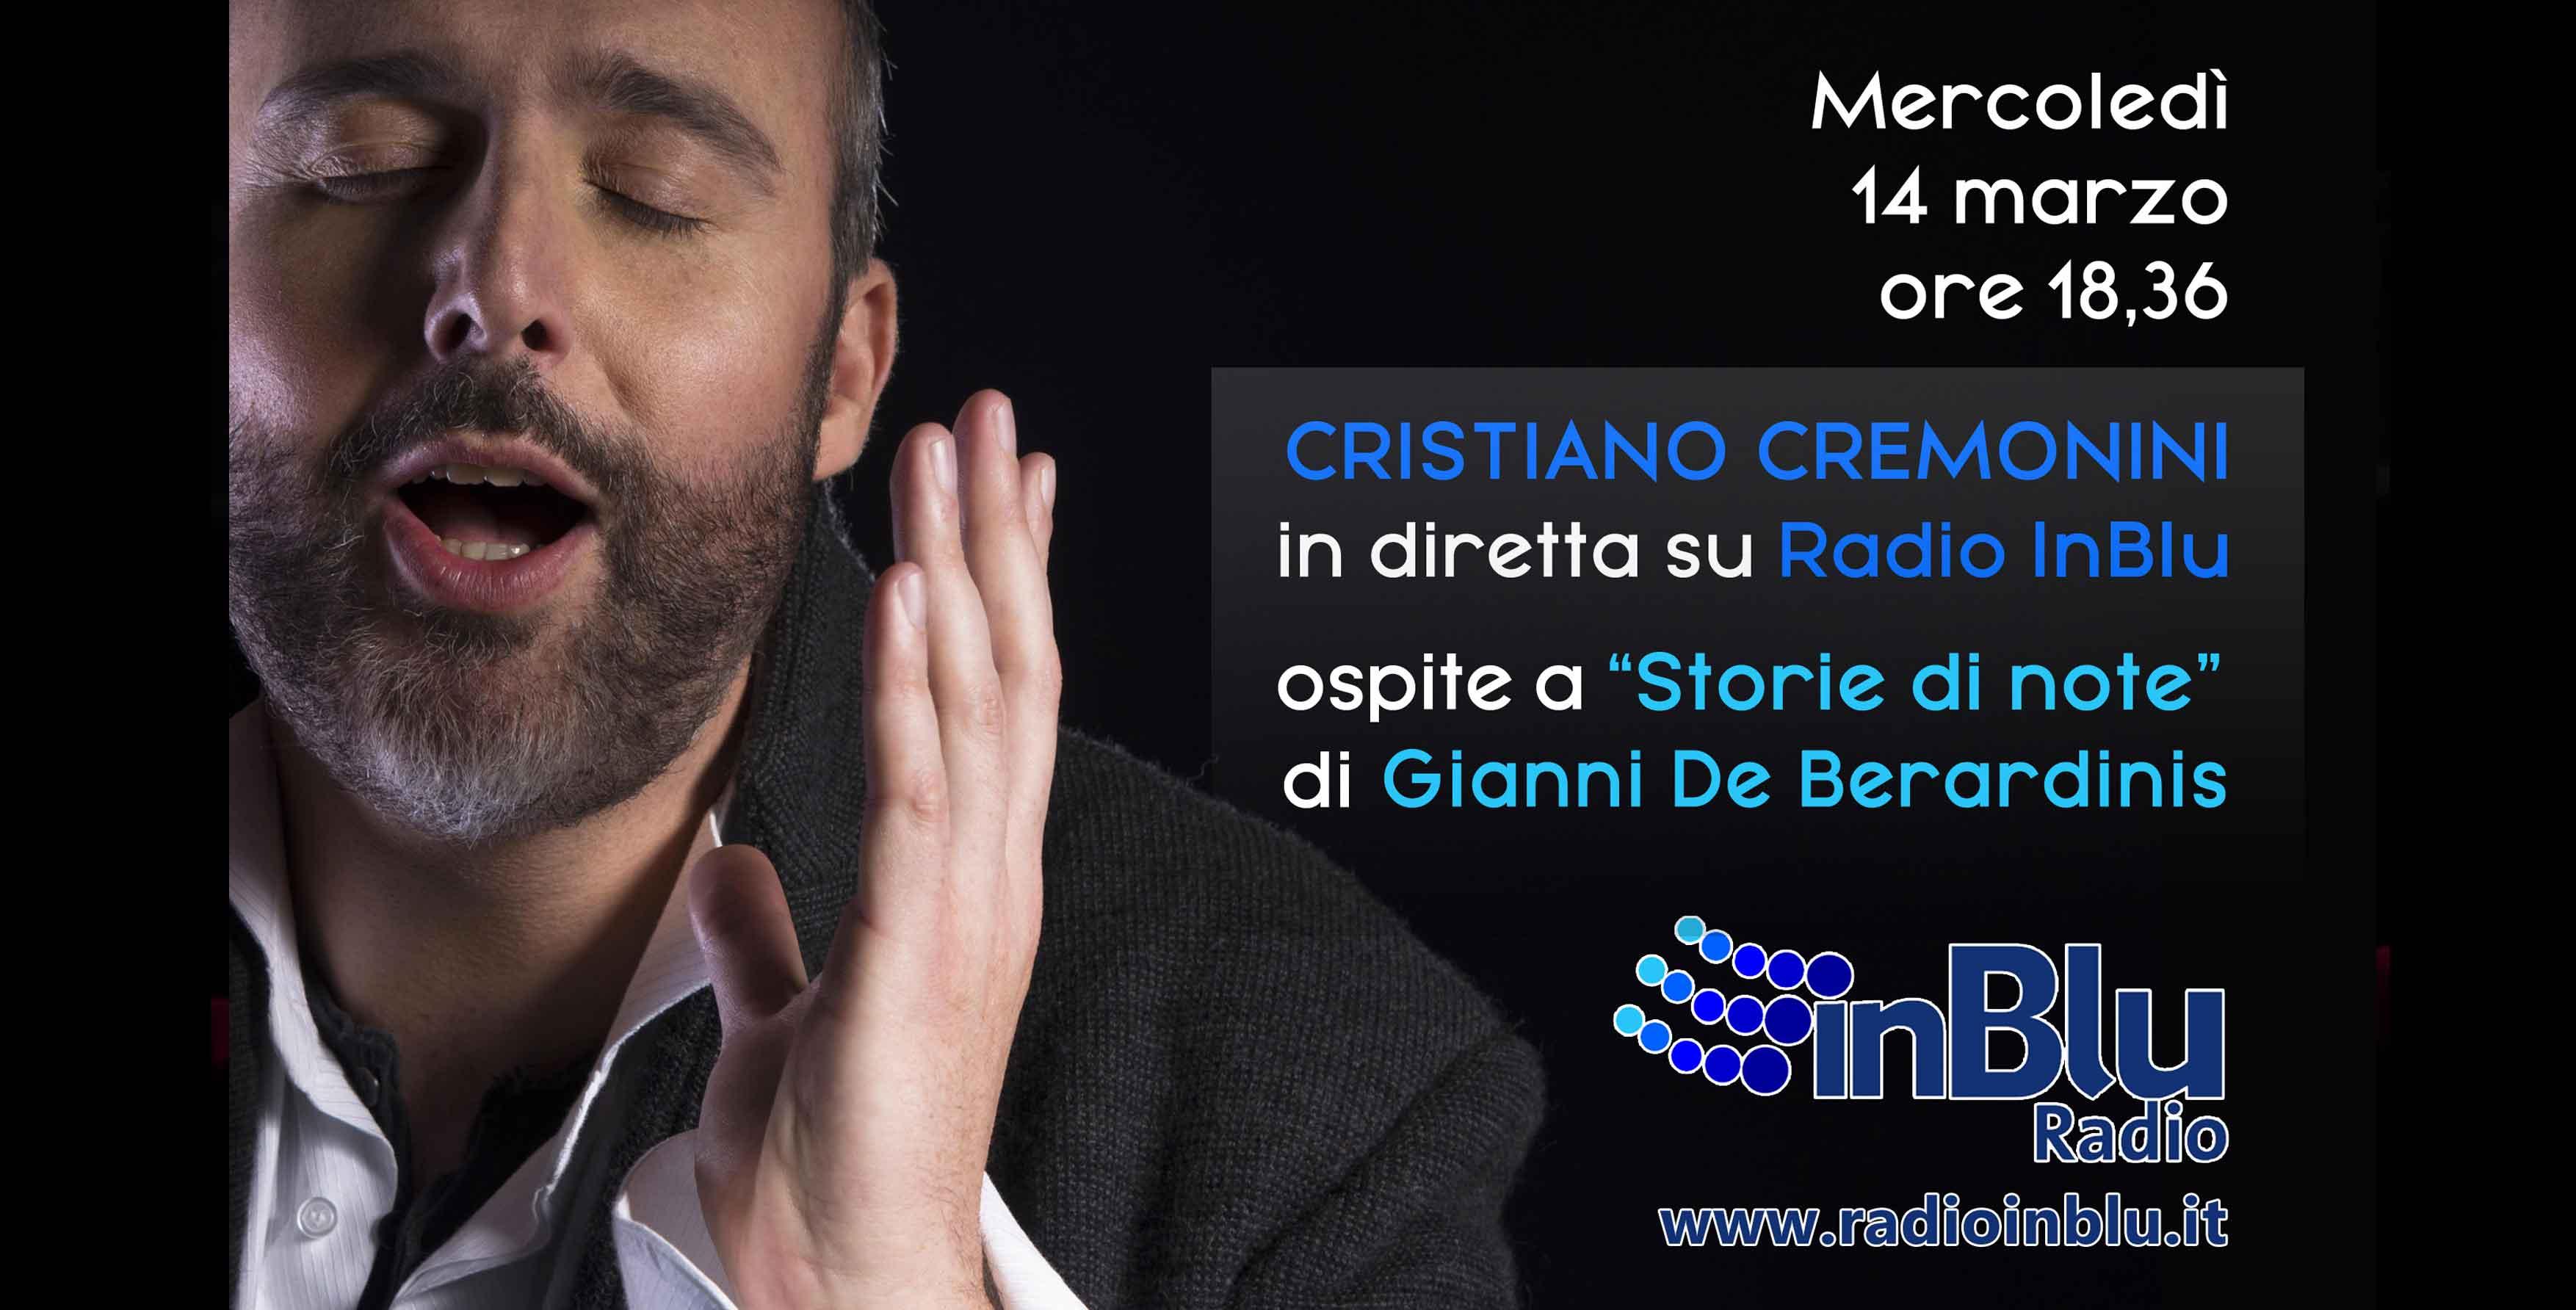 Cristiano-Cremonini-RadioInBlu-slide